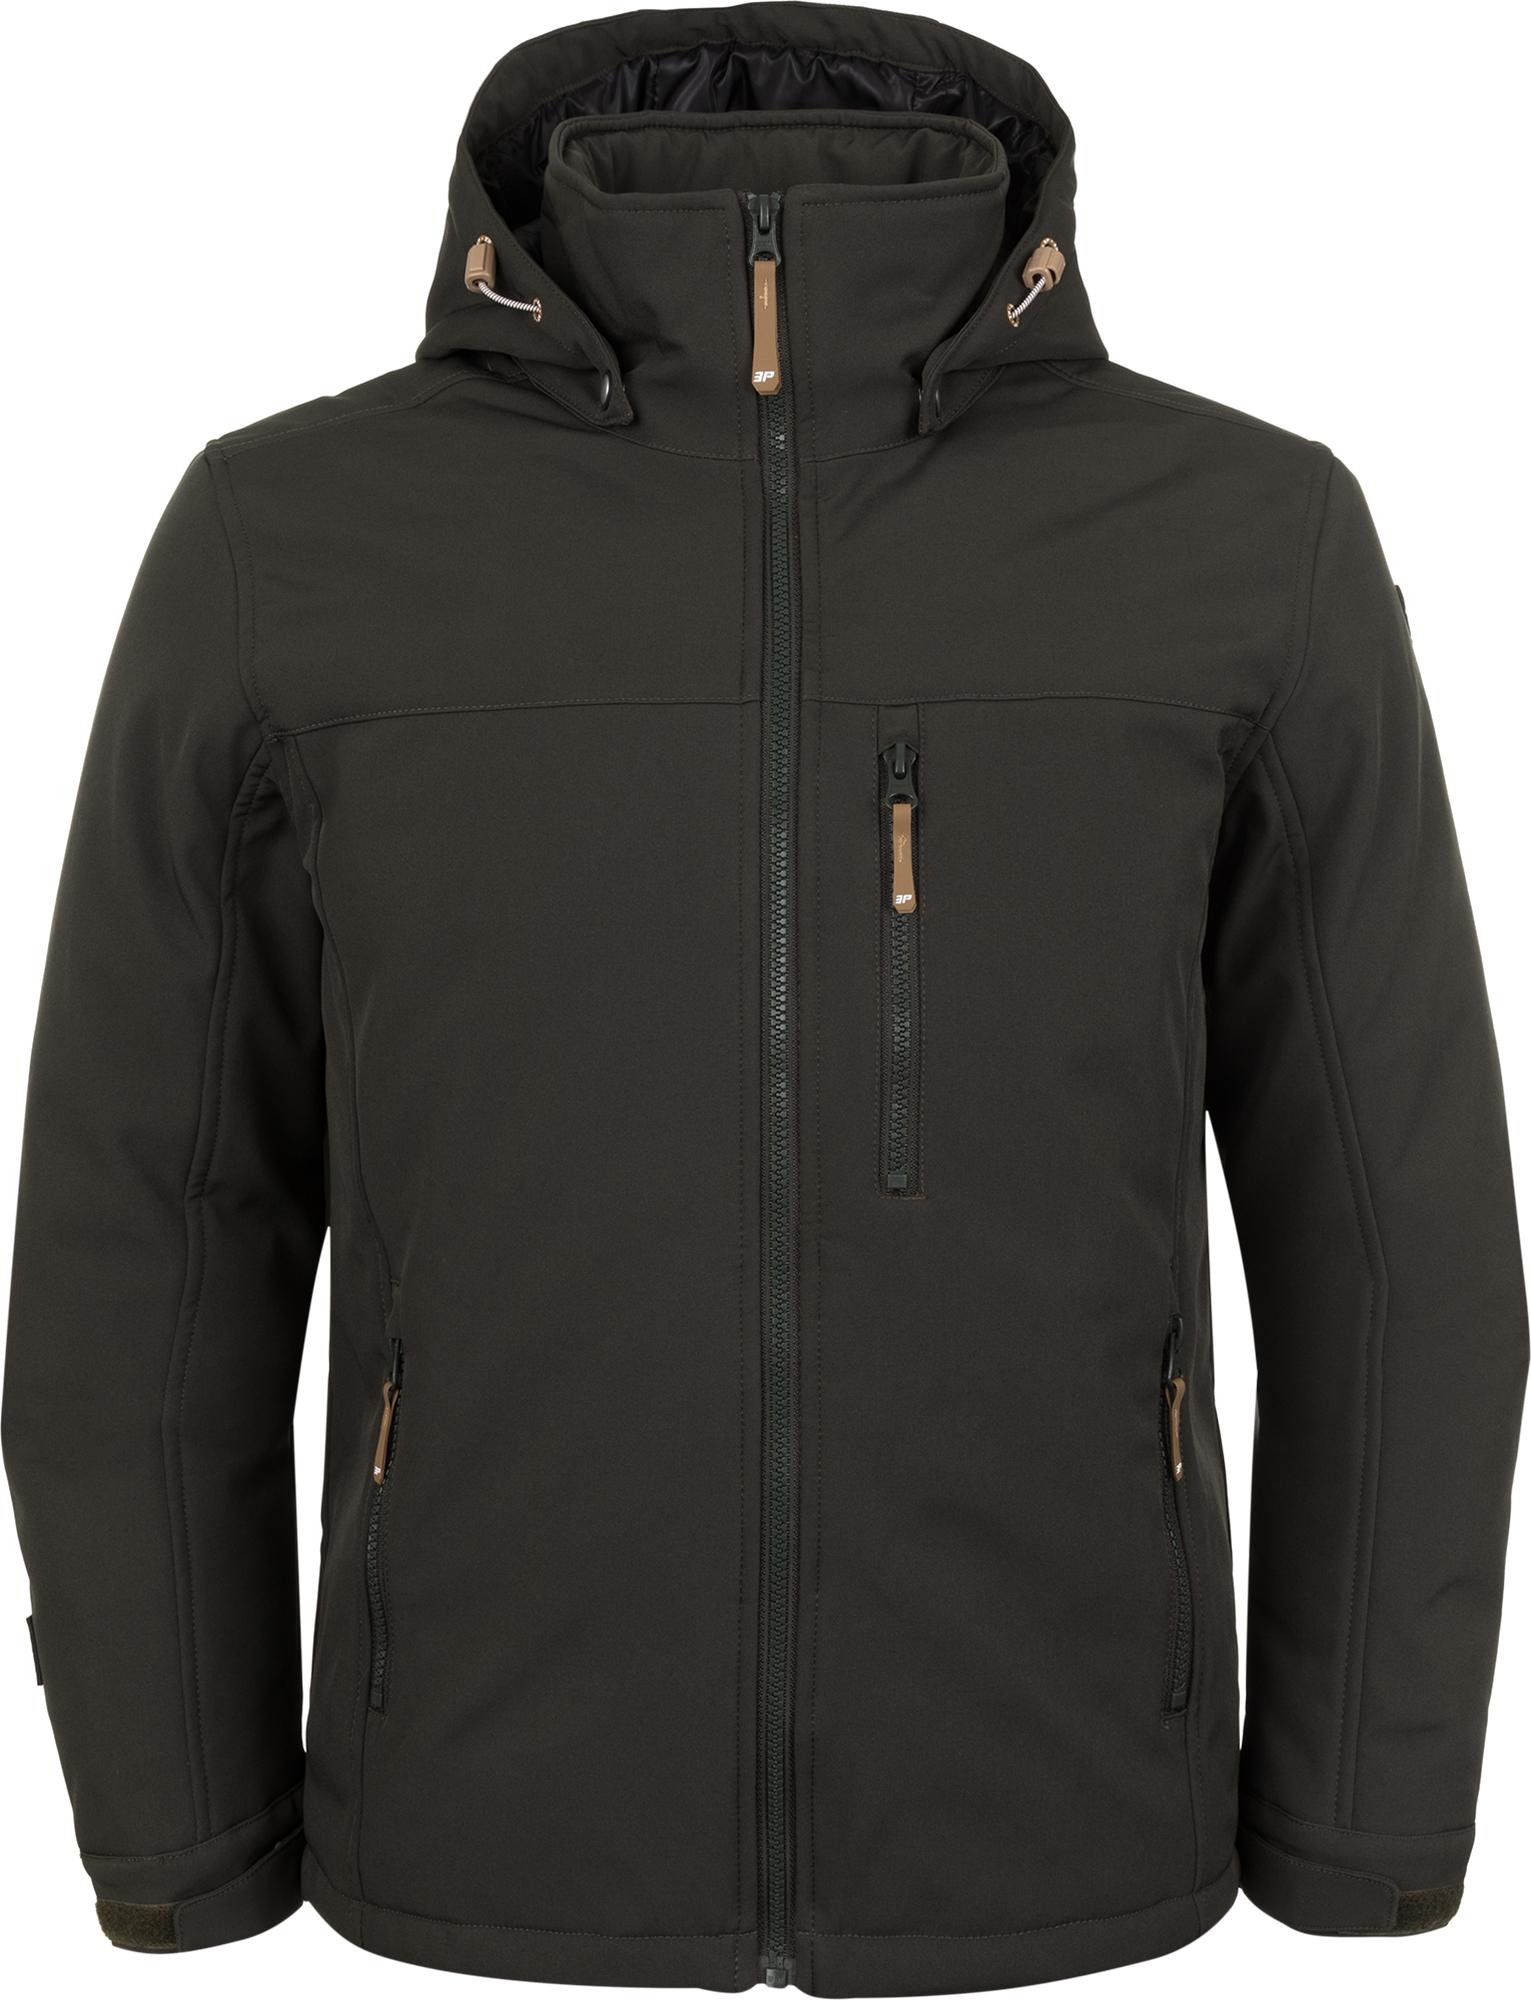 IcePeak Куртка утепленная мужская IcePeak Vinson, размер 52